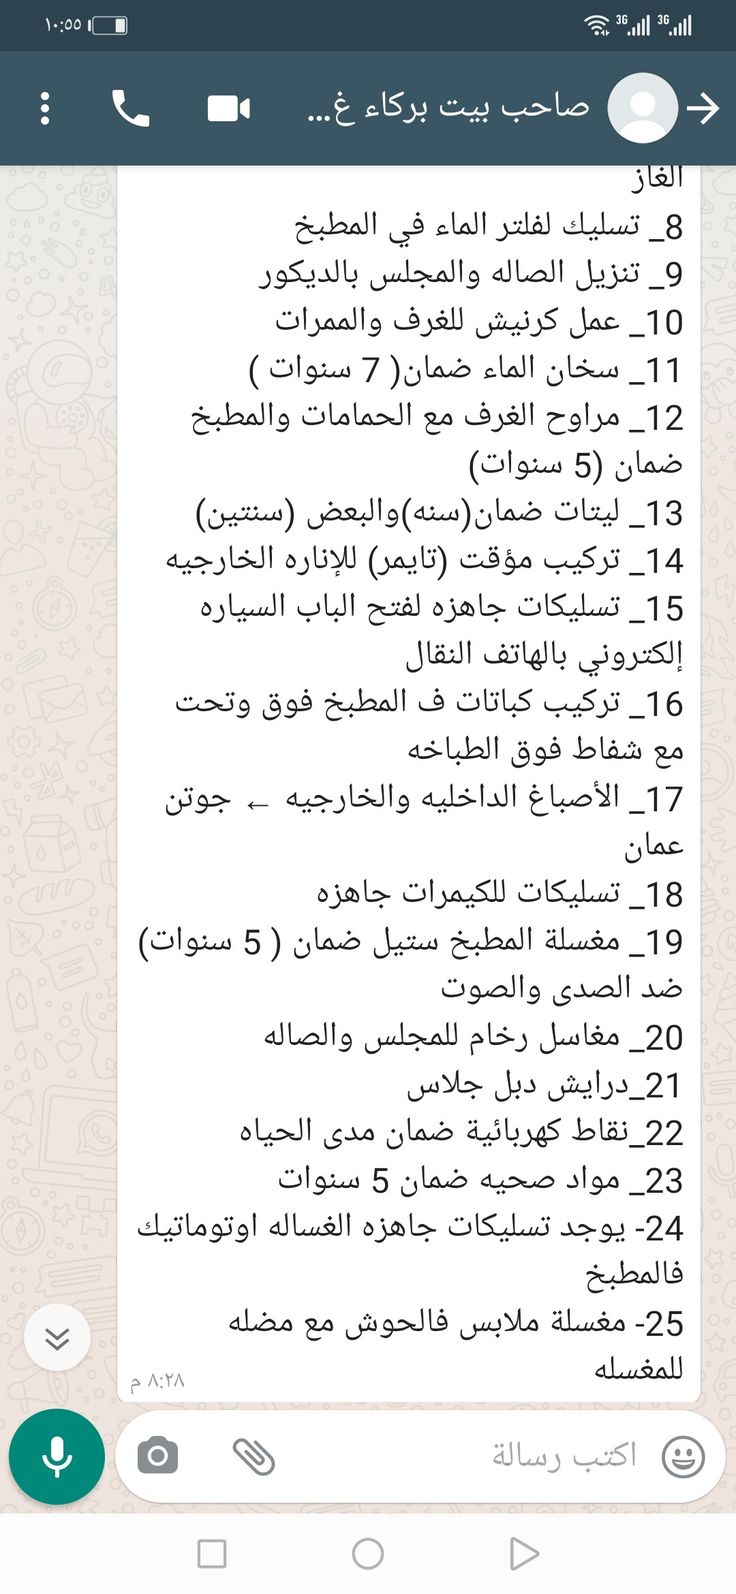 Pin By Msc1 Oman On ملاحظات البناء In 2020 10 Things